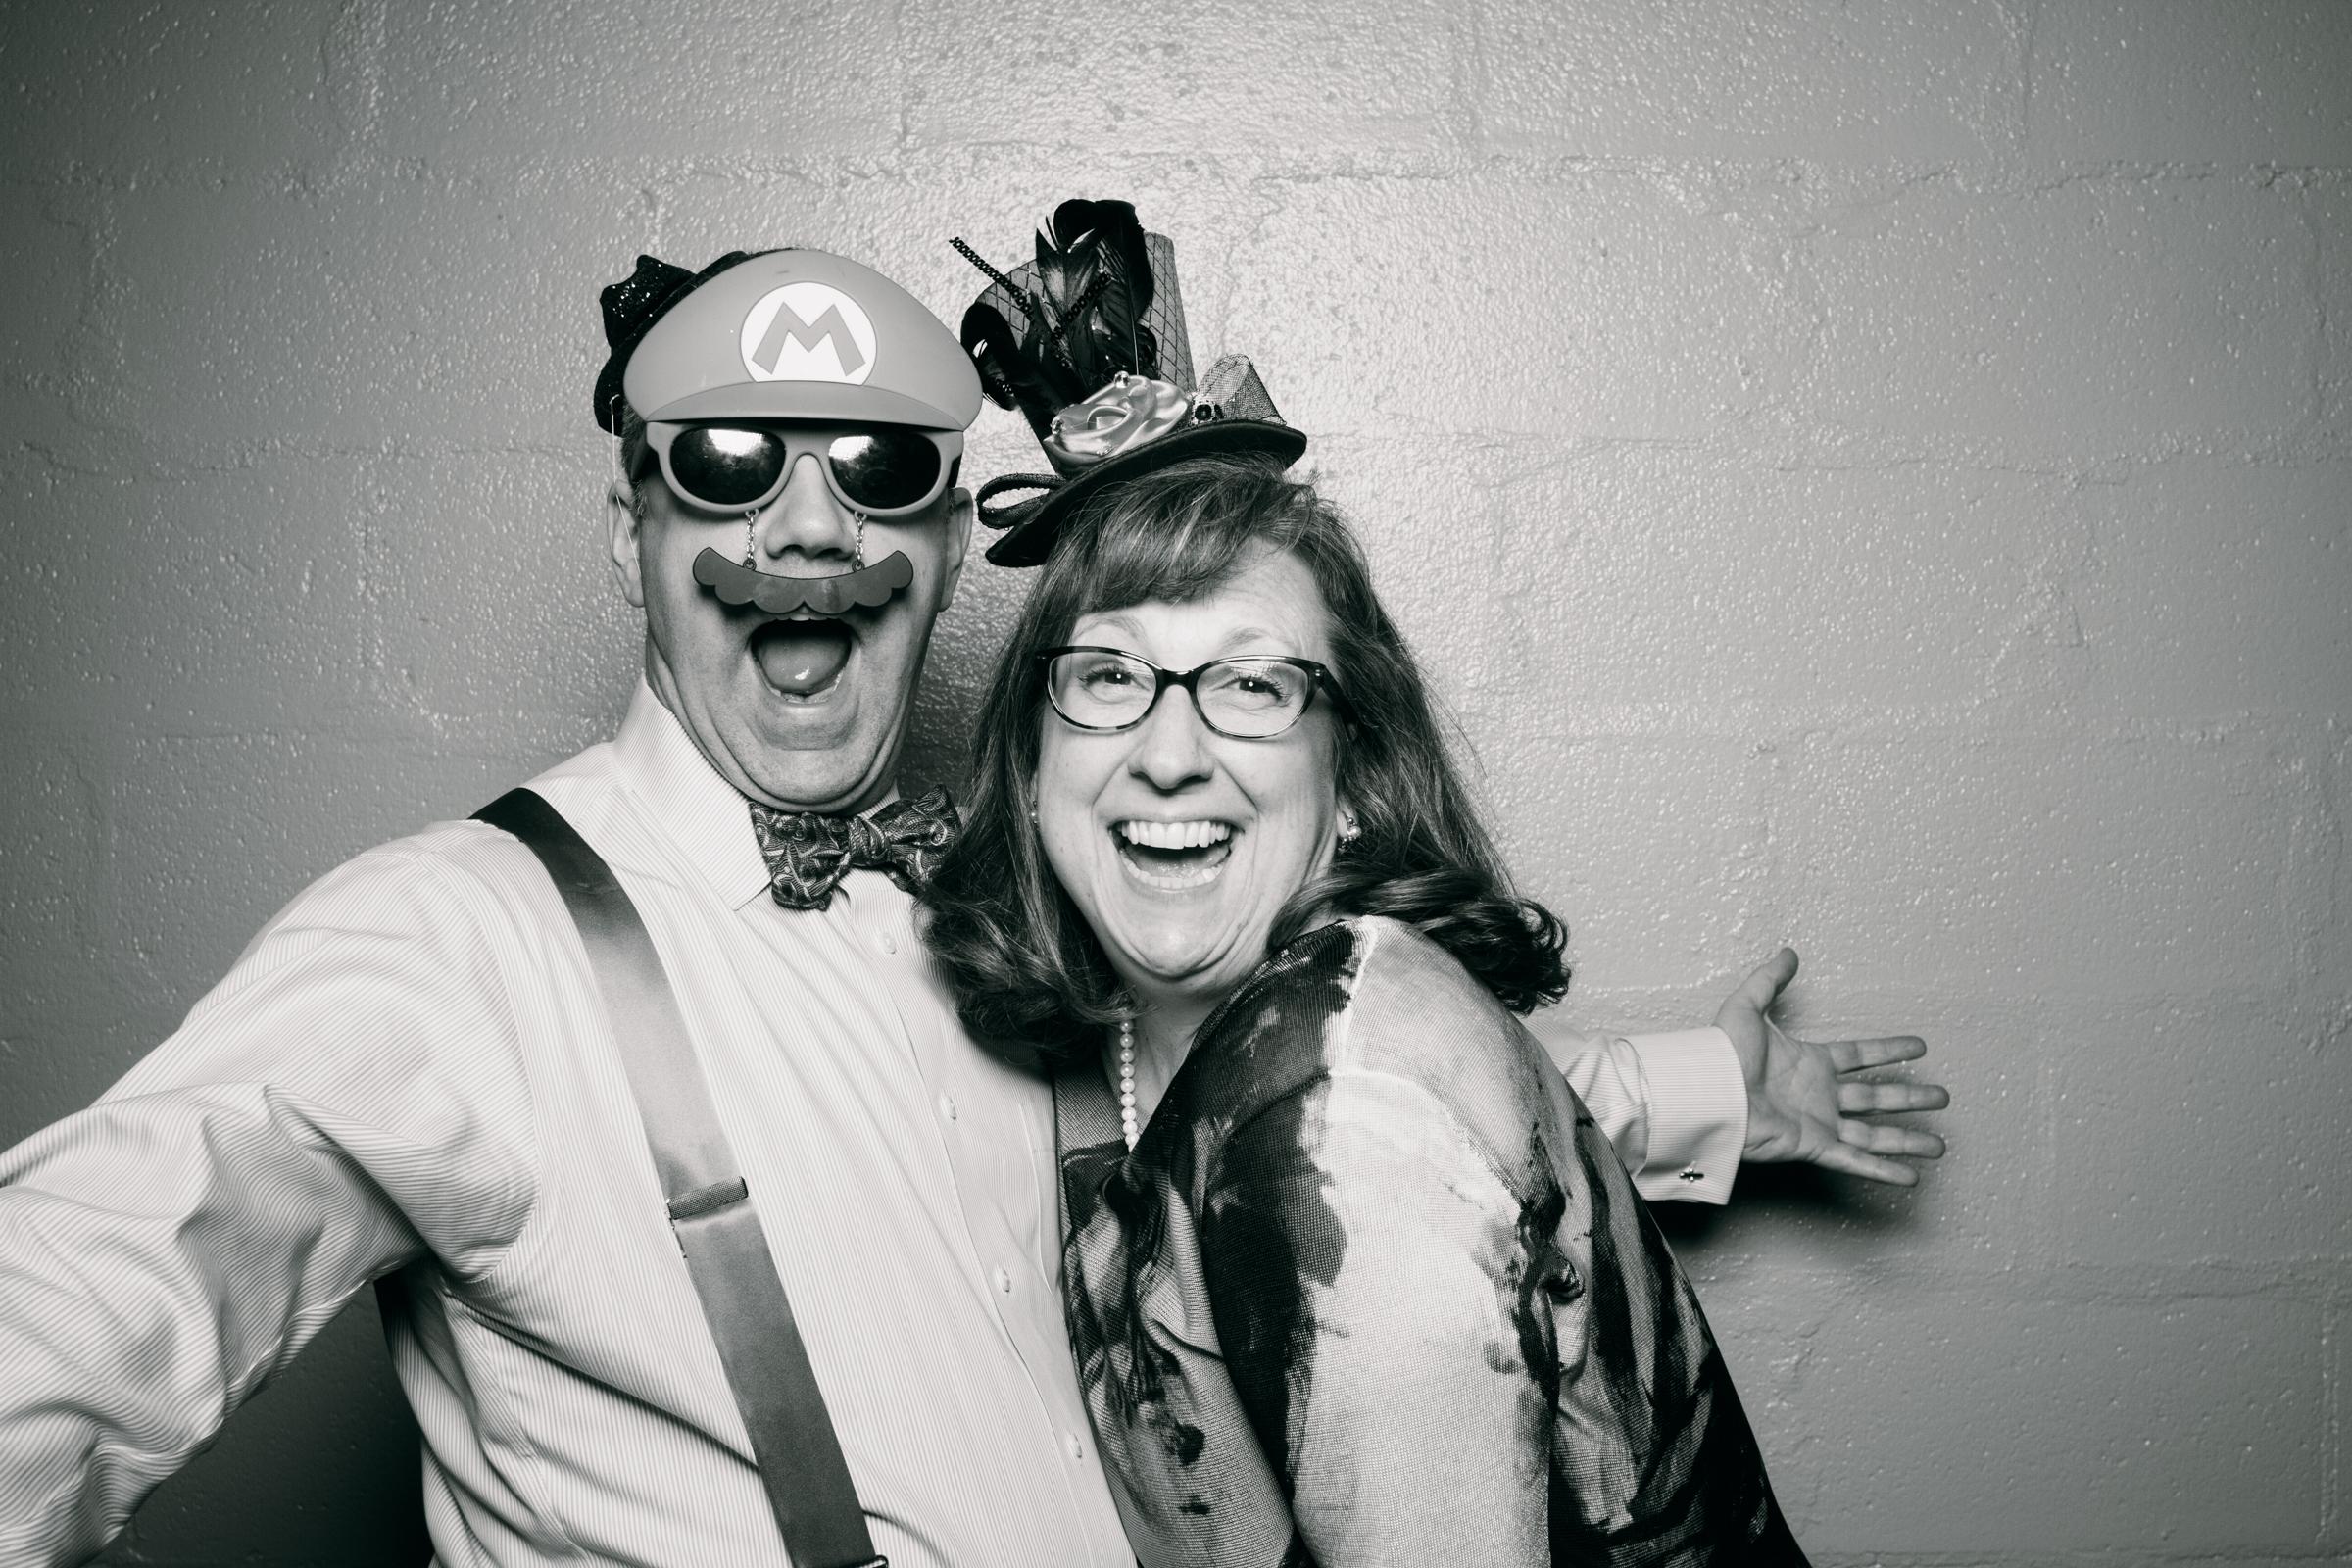 Ashley-John-Wedding-Photo-Booth-3.jpg